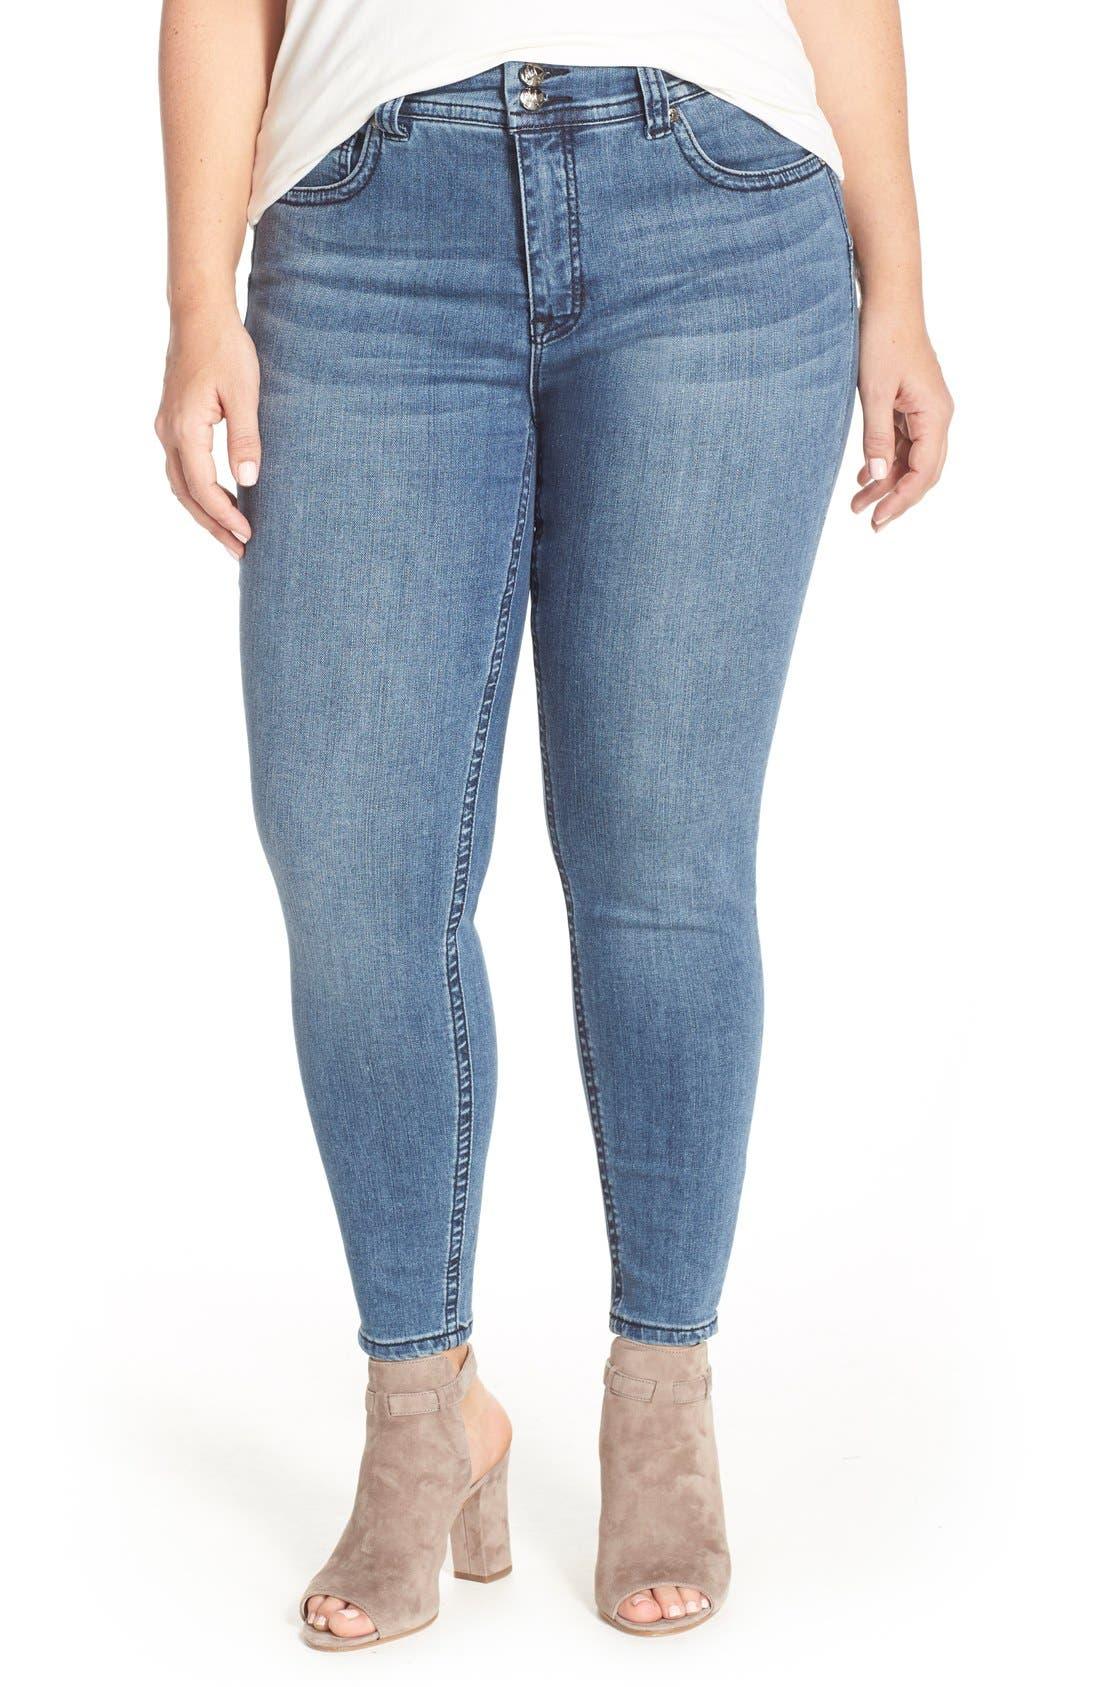 MELISSA MCCARTHY SEVEN7 High Waist Stretch Pencil Jeans